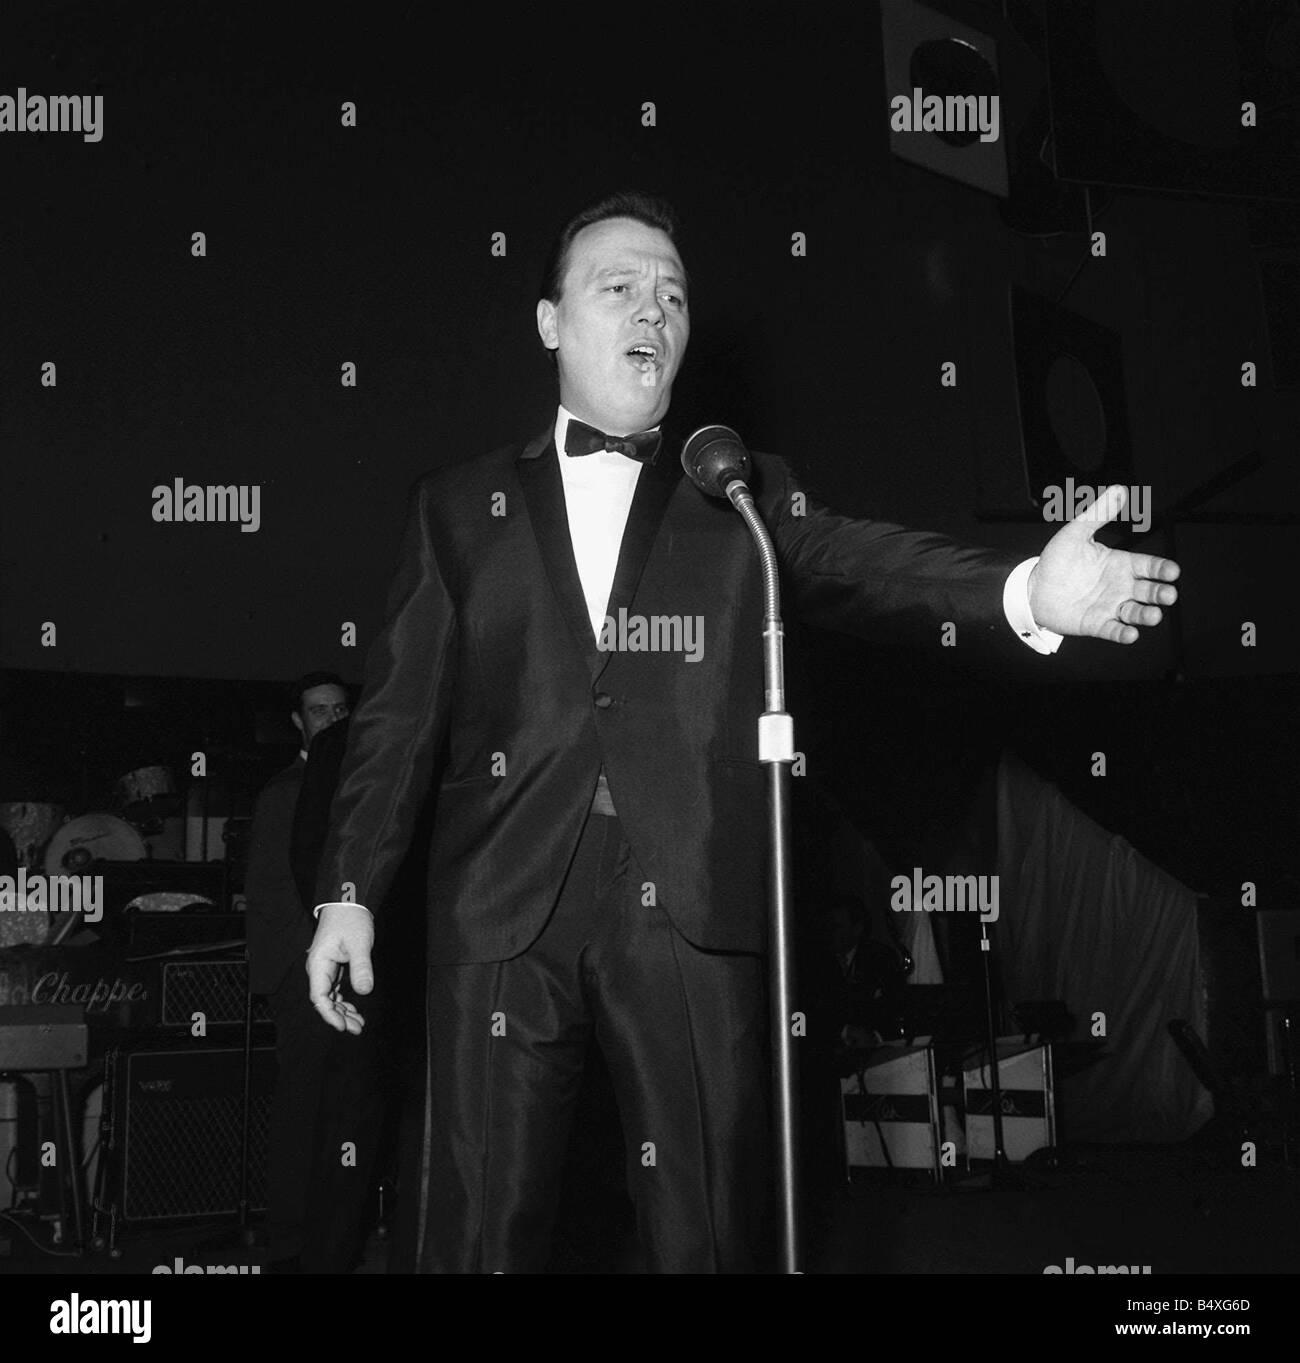 Matt Monro Eurovision 1964 I Love The Little Things